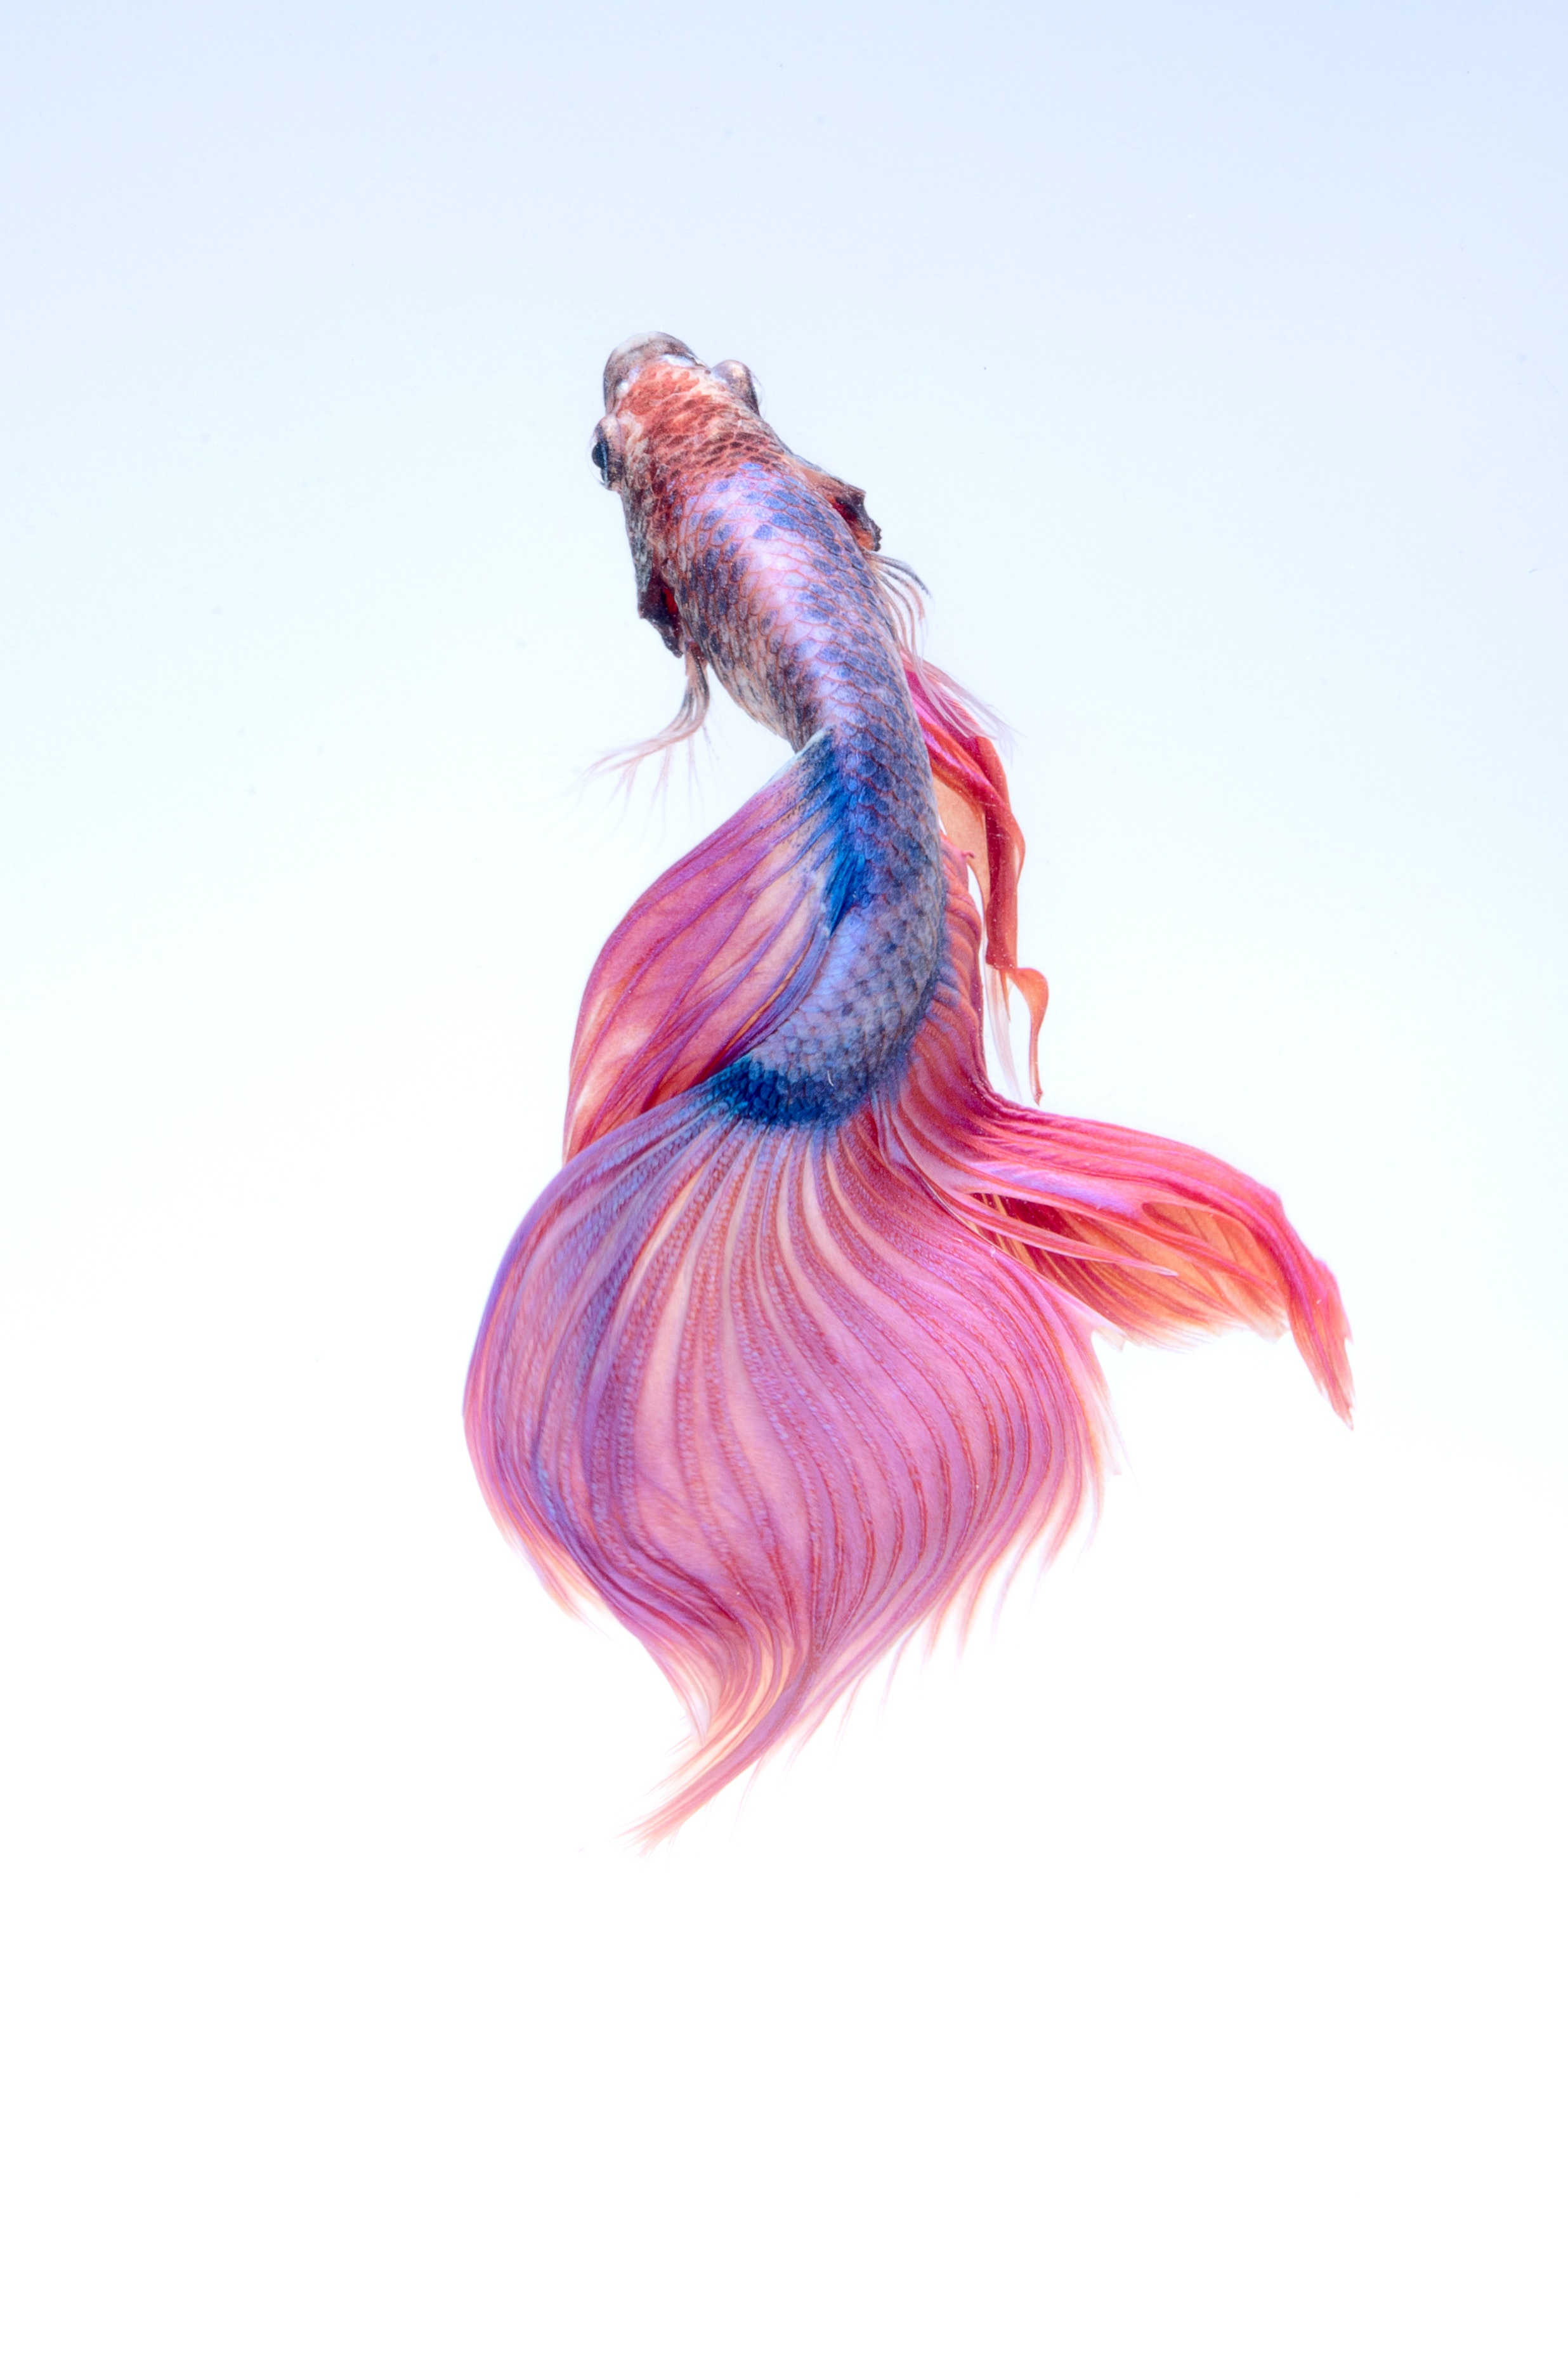 animal-art-beautiful-325045.jpg